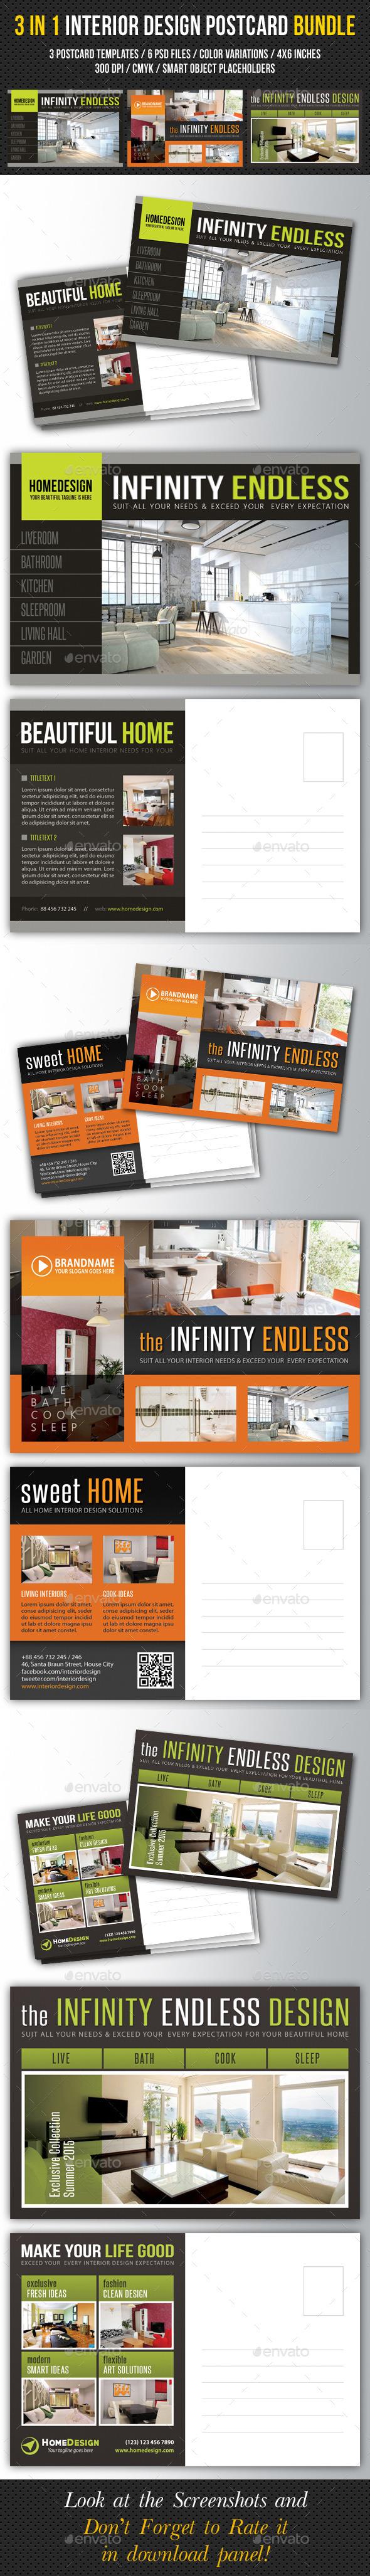 3 in 1 Interior Design Postcard Template Bundle 02 - Cards & Invites Print Templates